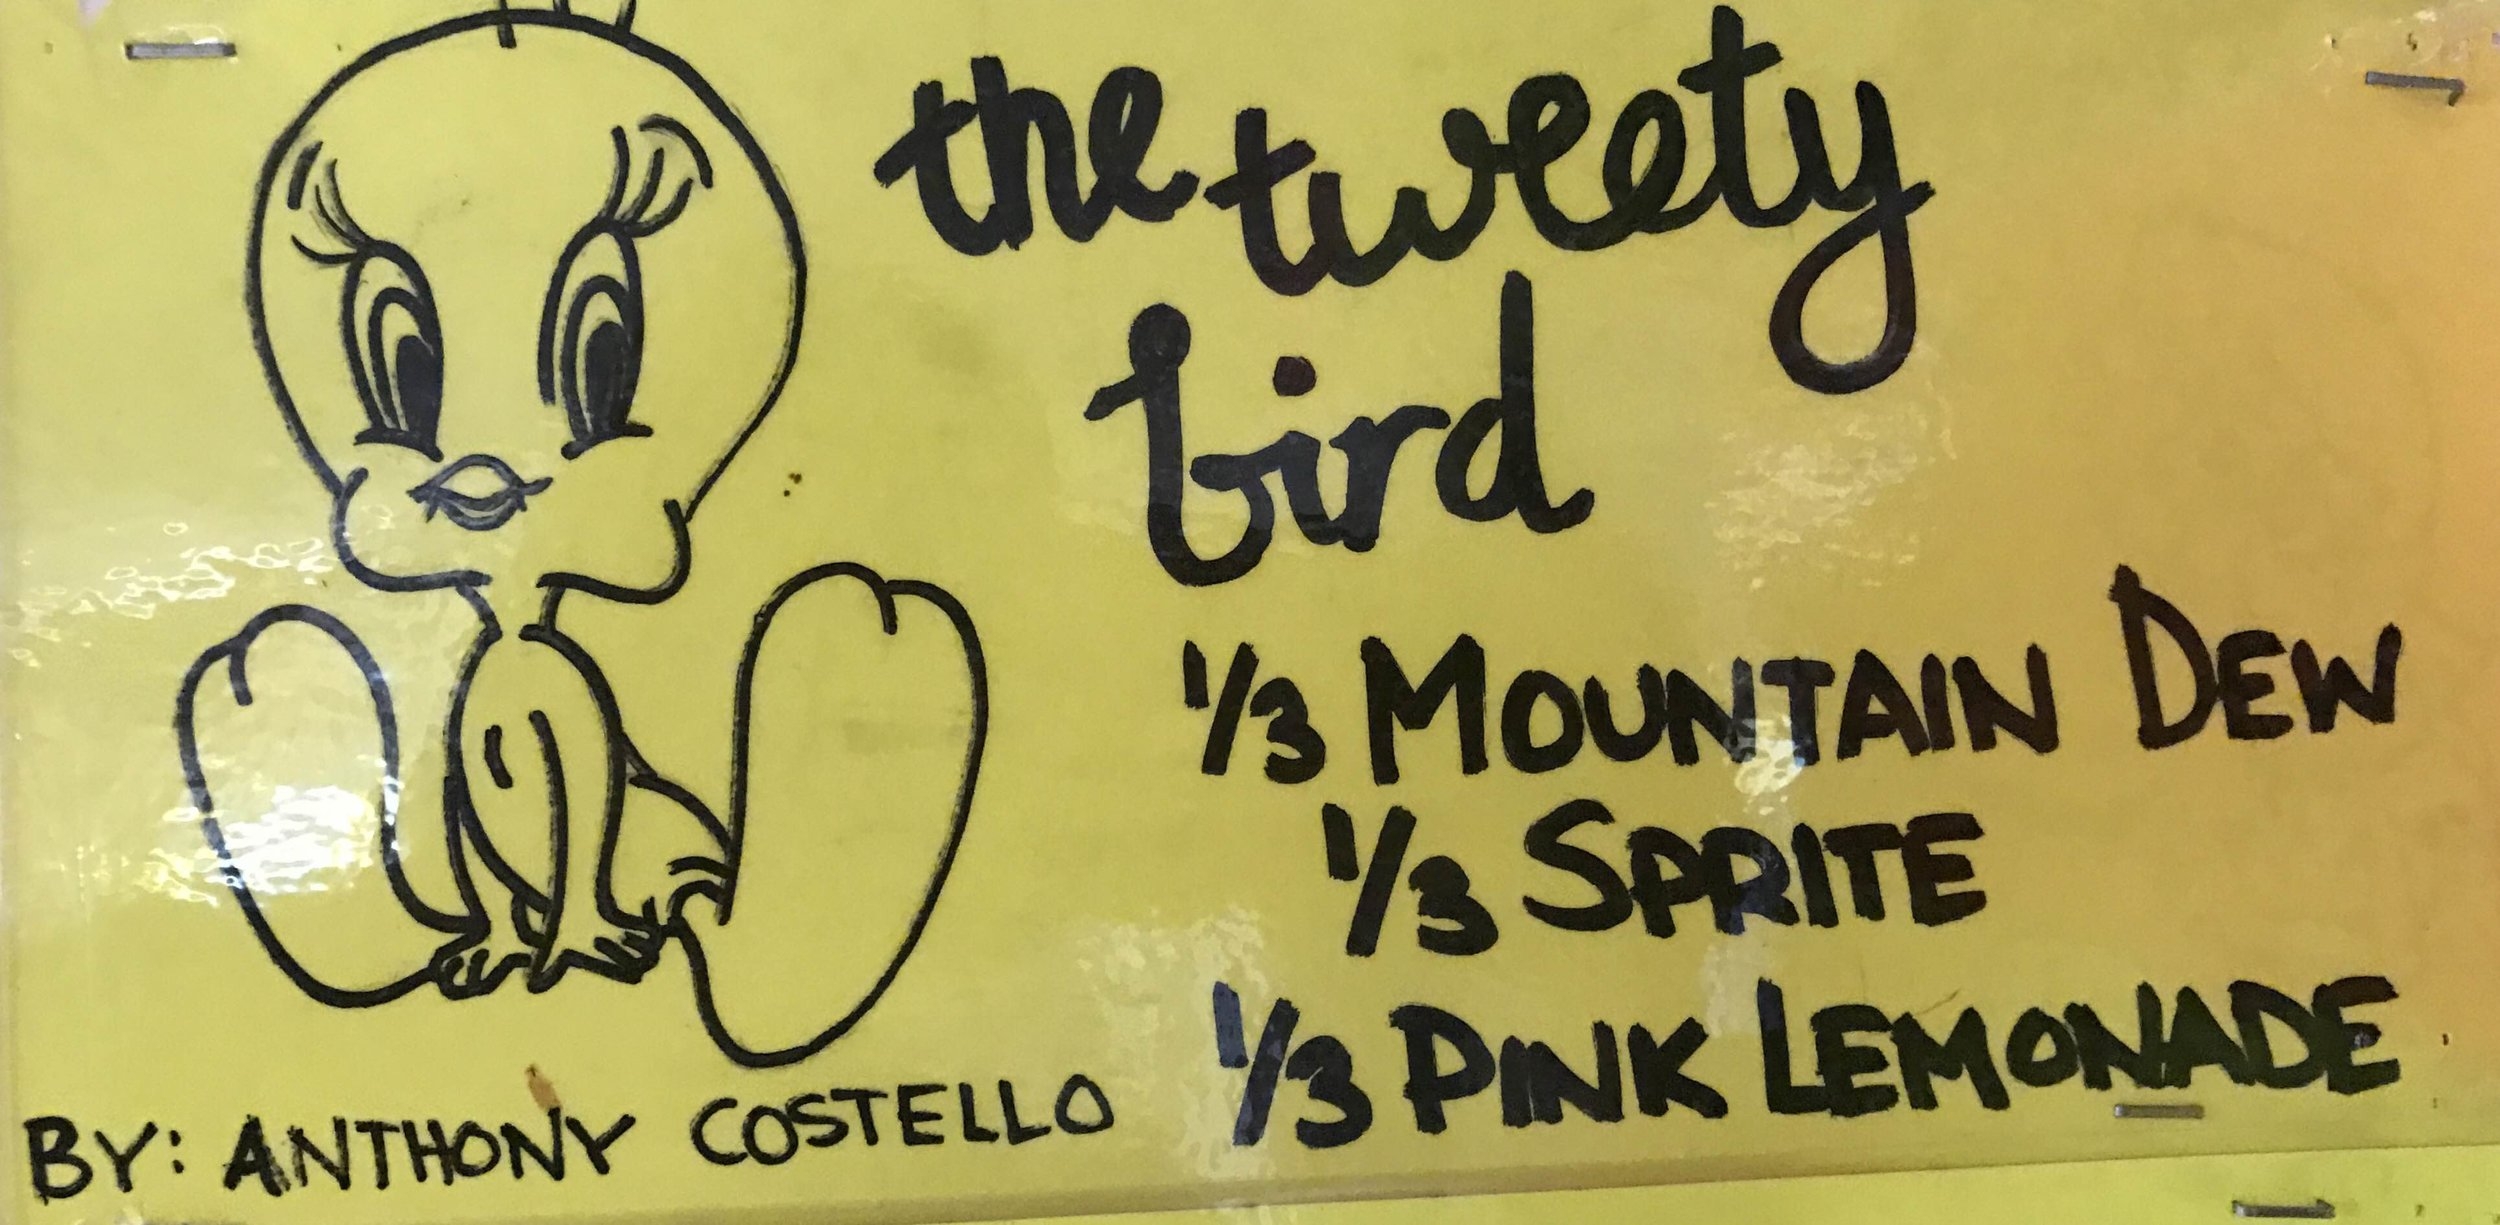 The Tweety Bird.JPG